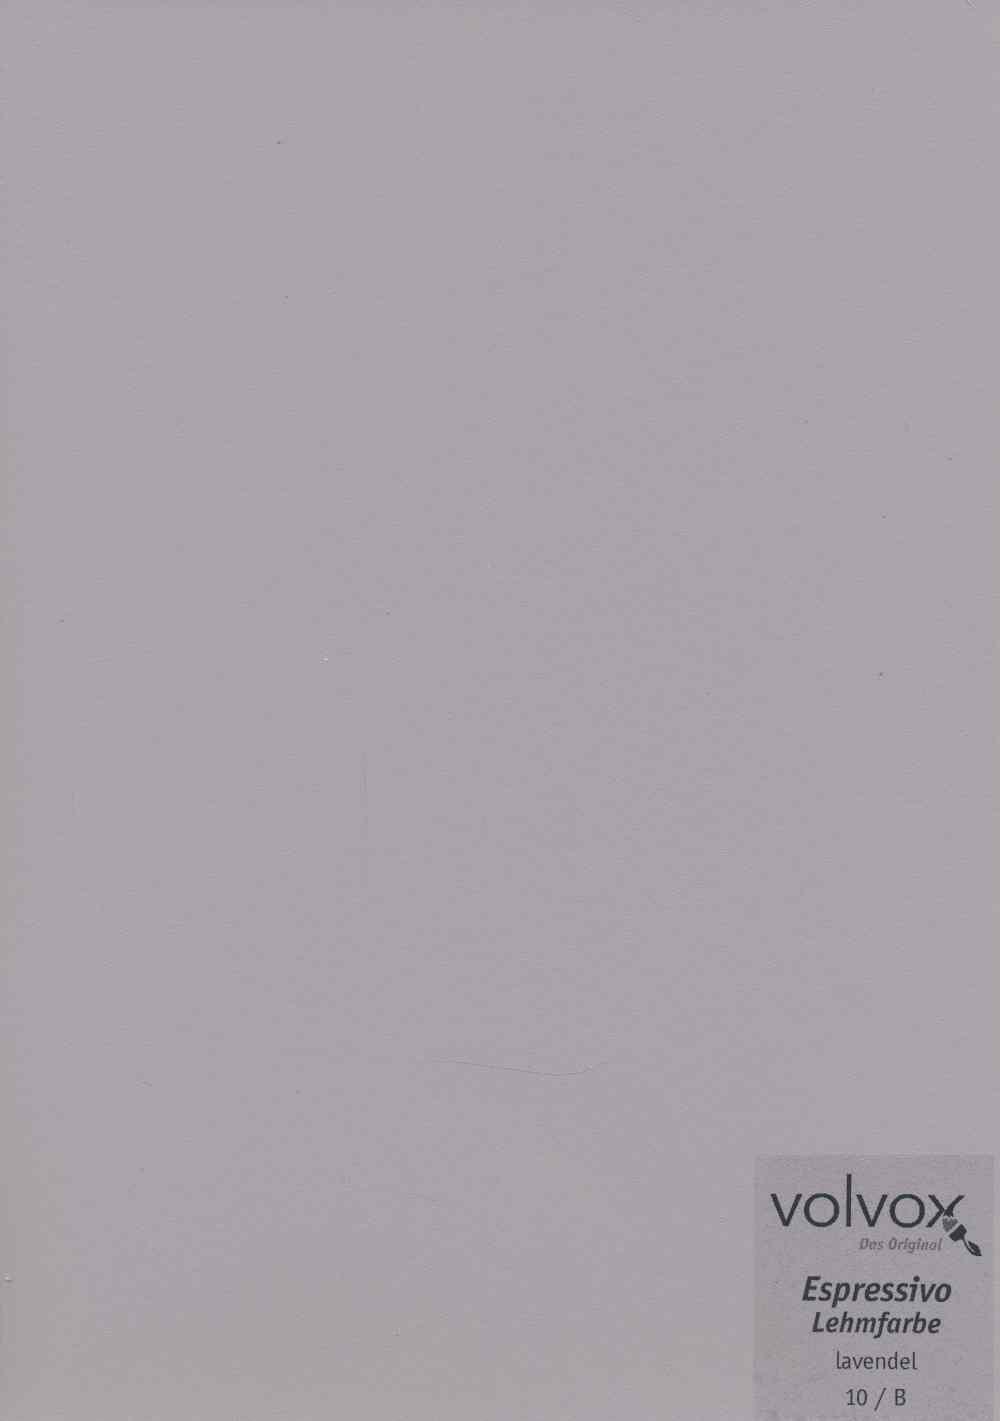 Volvox Espressivo Lehmfarbe 010 lavendel